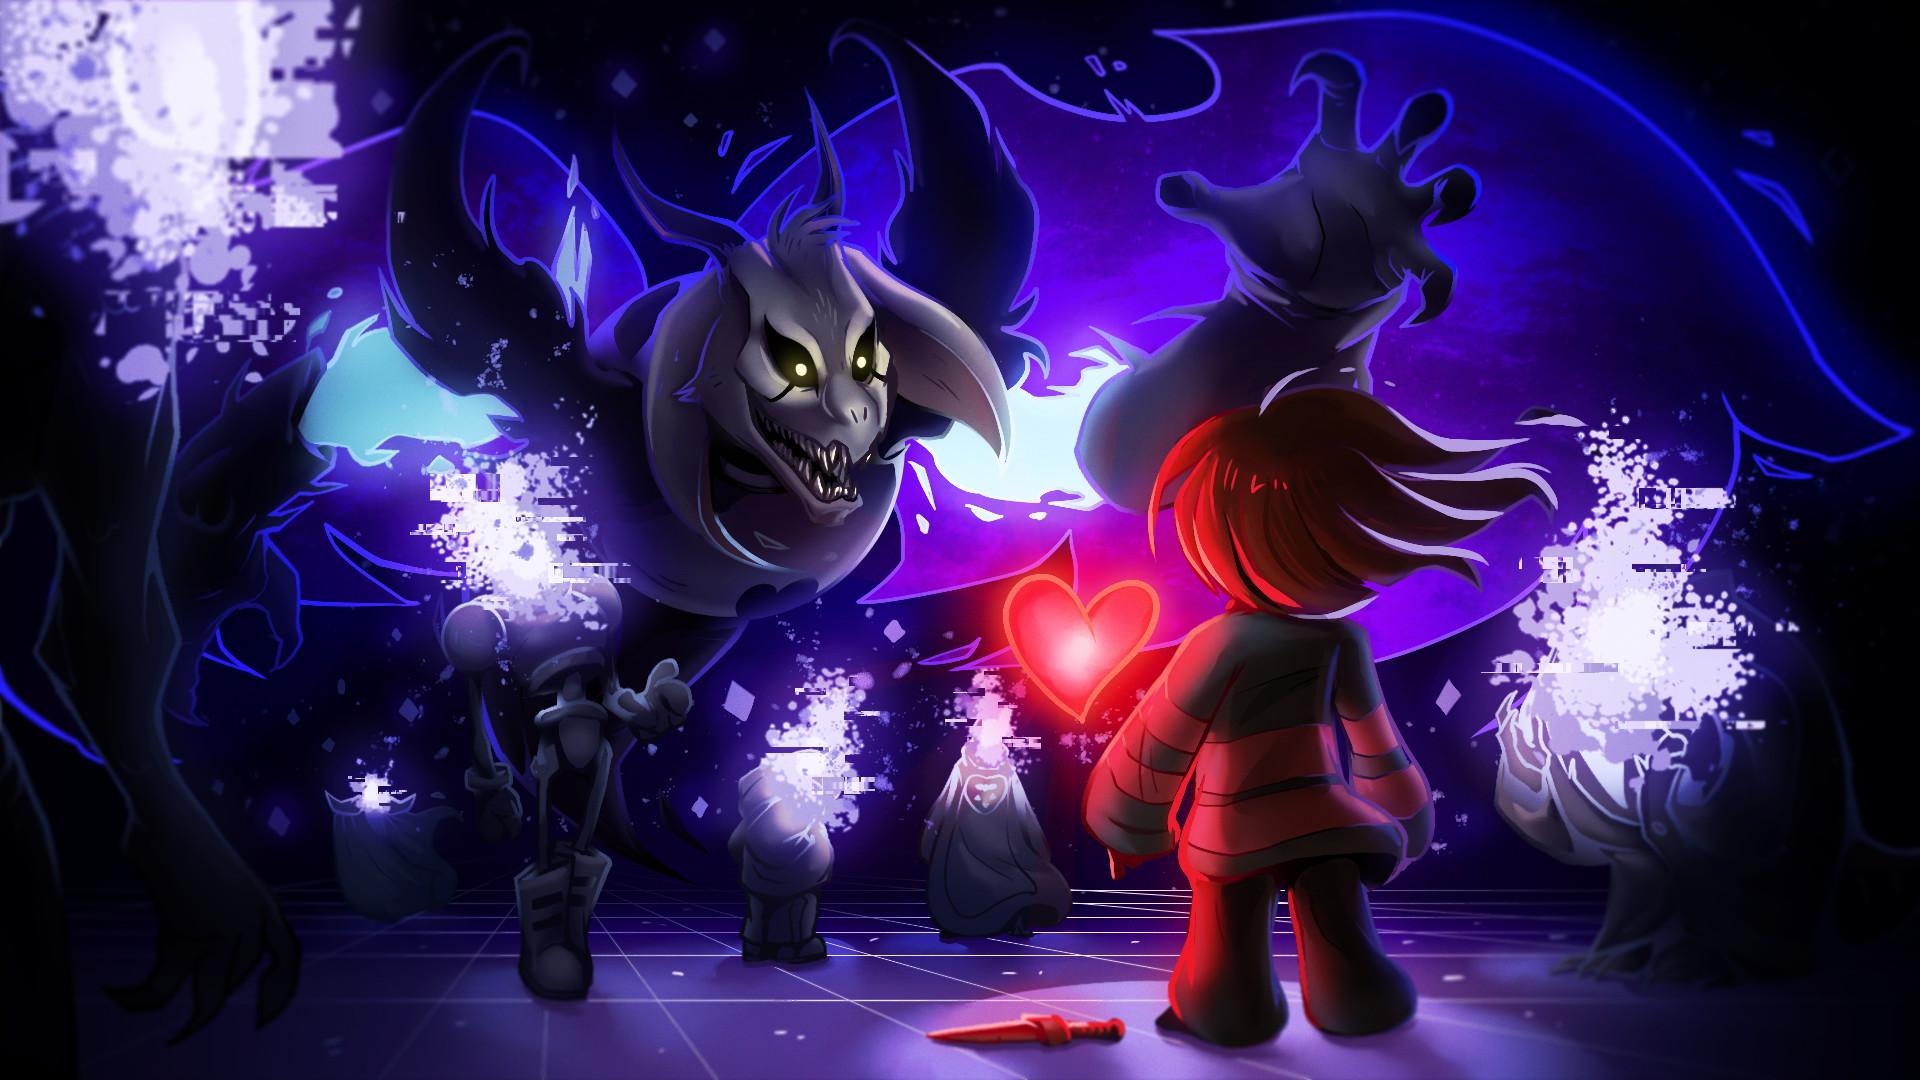 undertale 3d game download